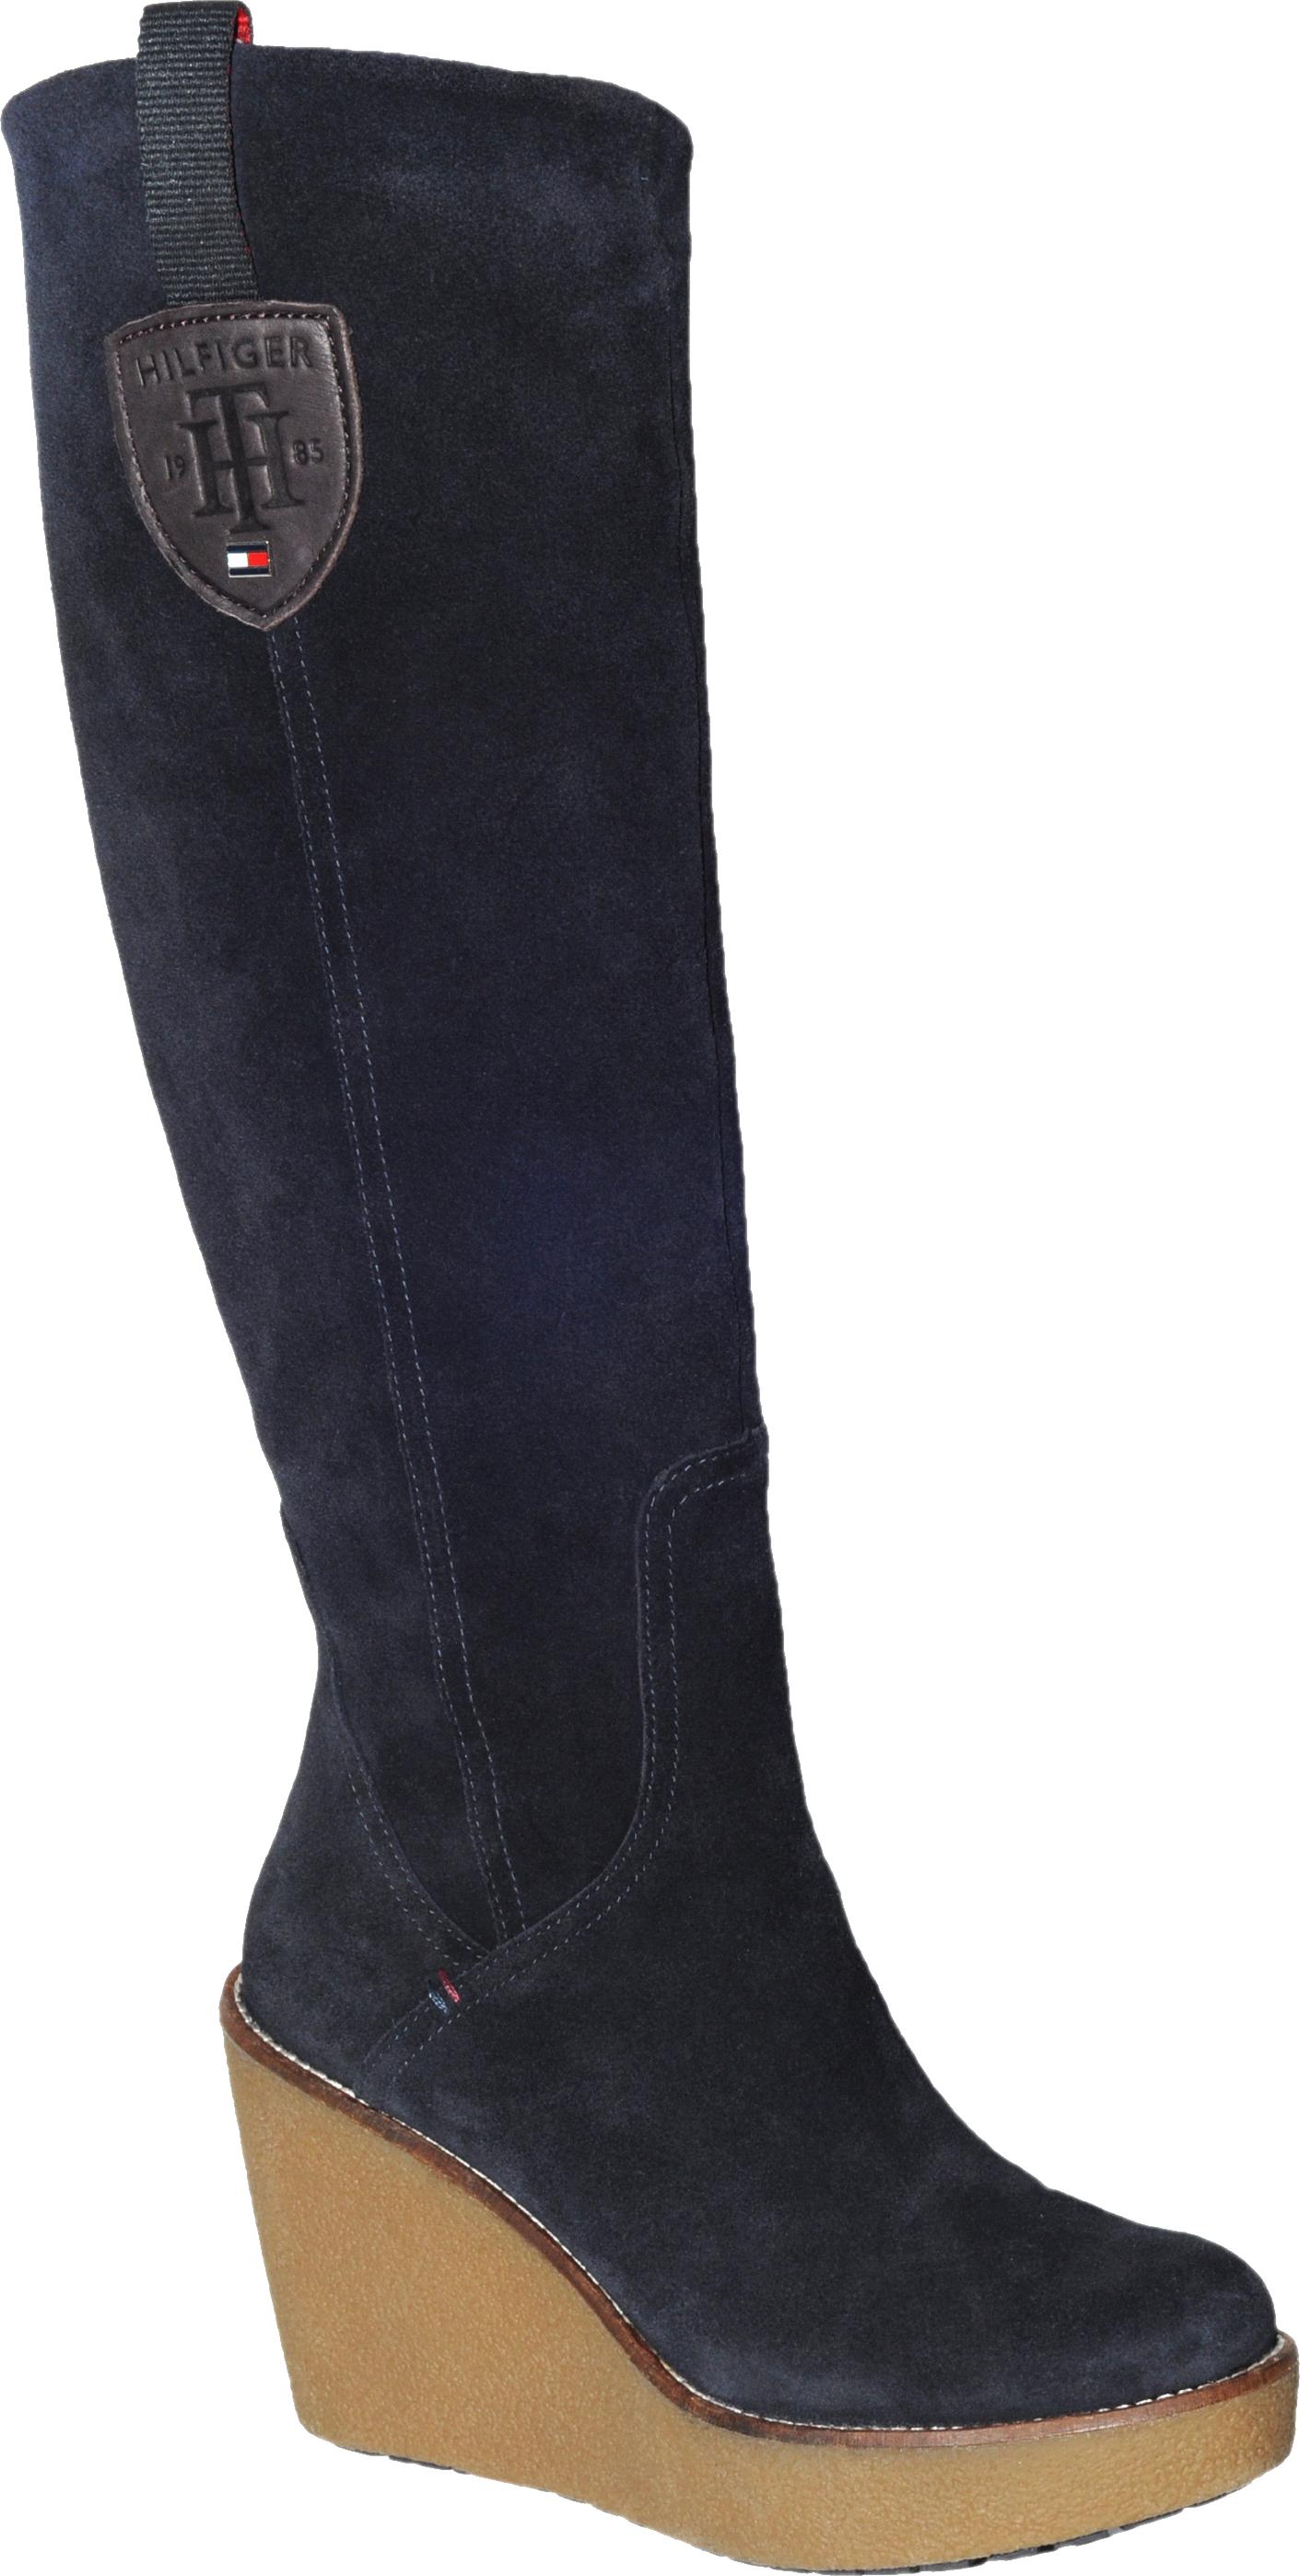 Hilfiger Women's Boot PNG Image